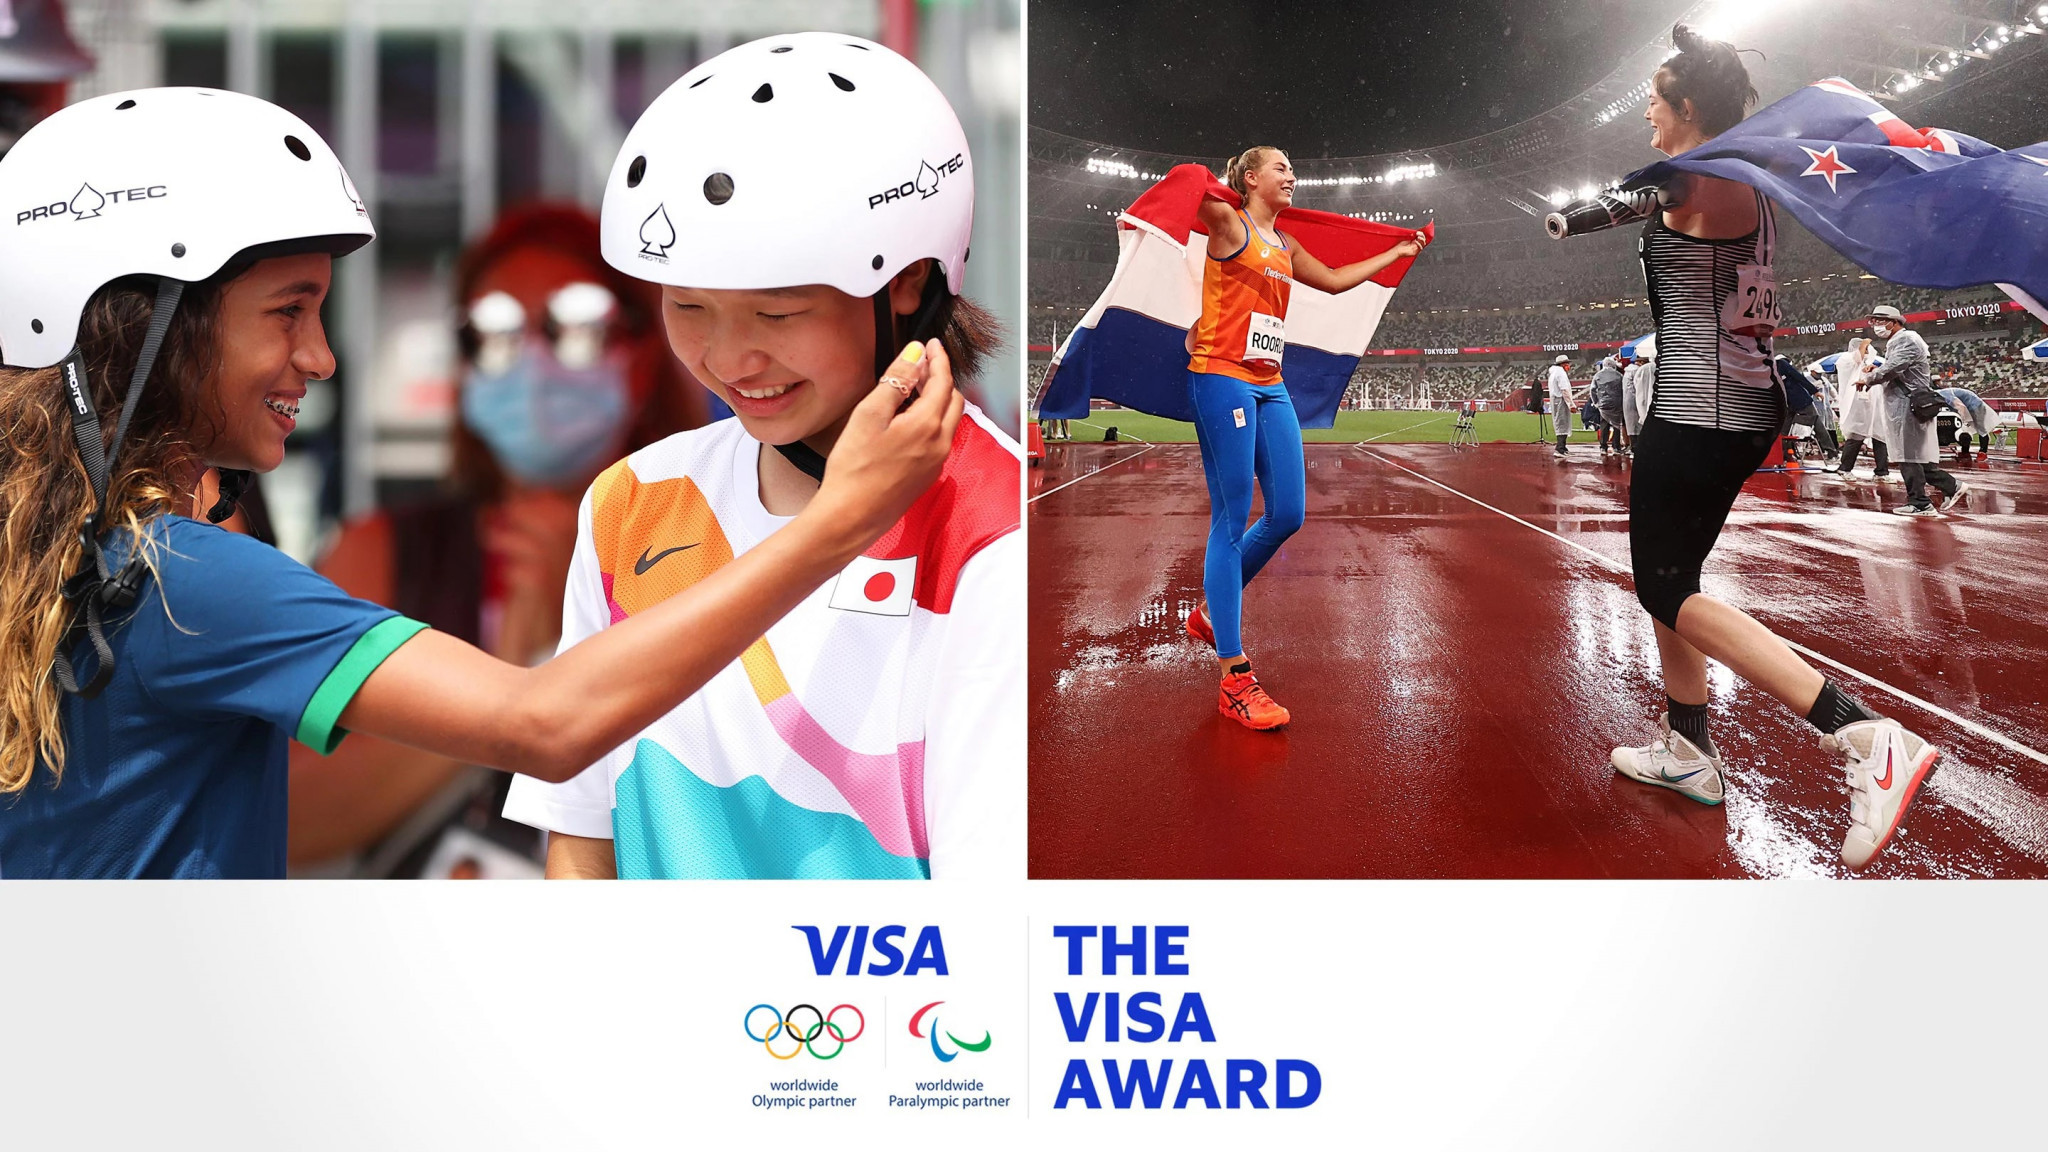 Visa Award winners Leal and Robinson choose charities to receive funding boost